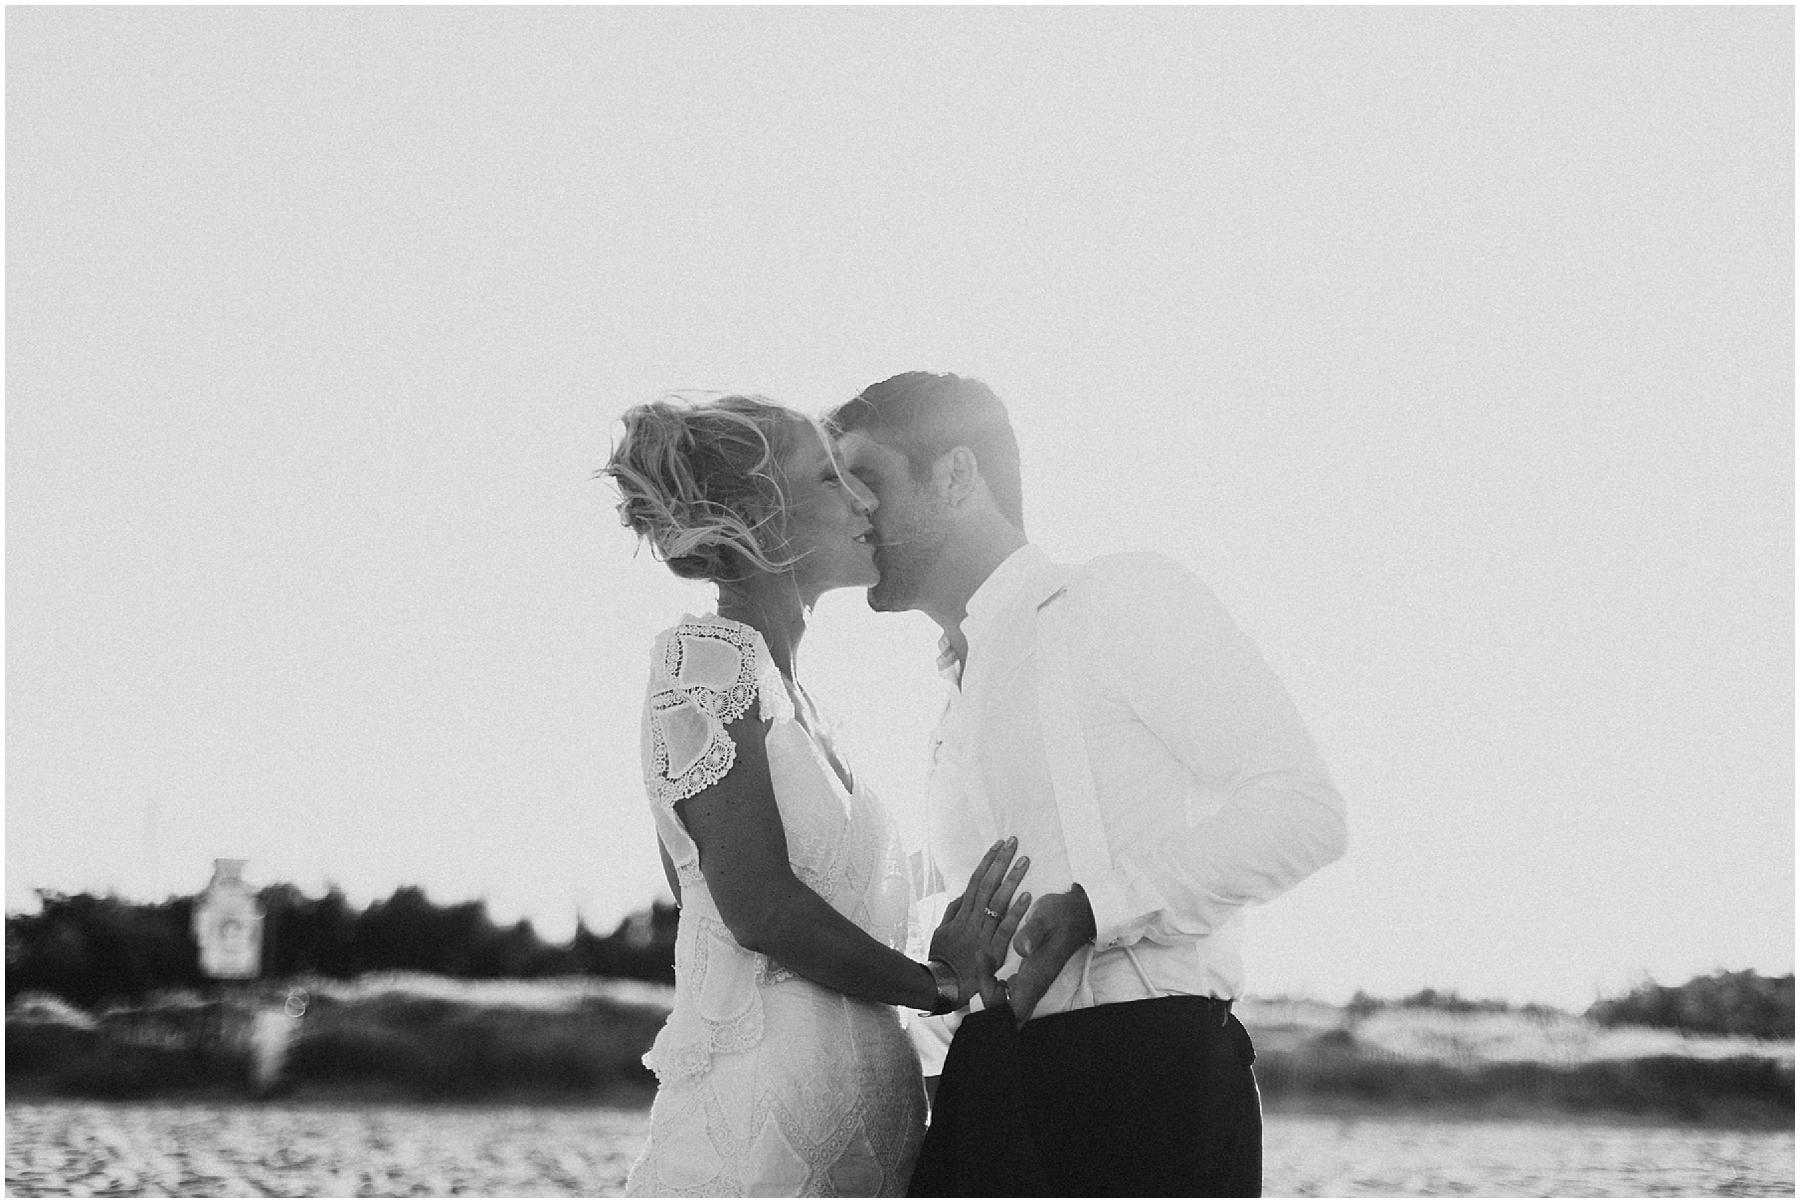 Mariage plage Saint Tropez